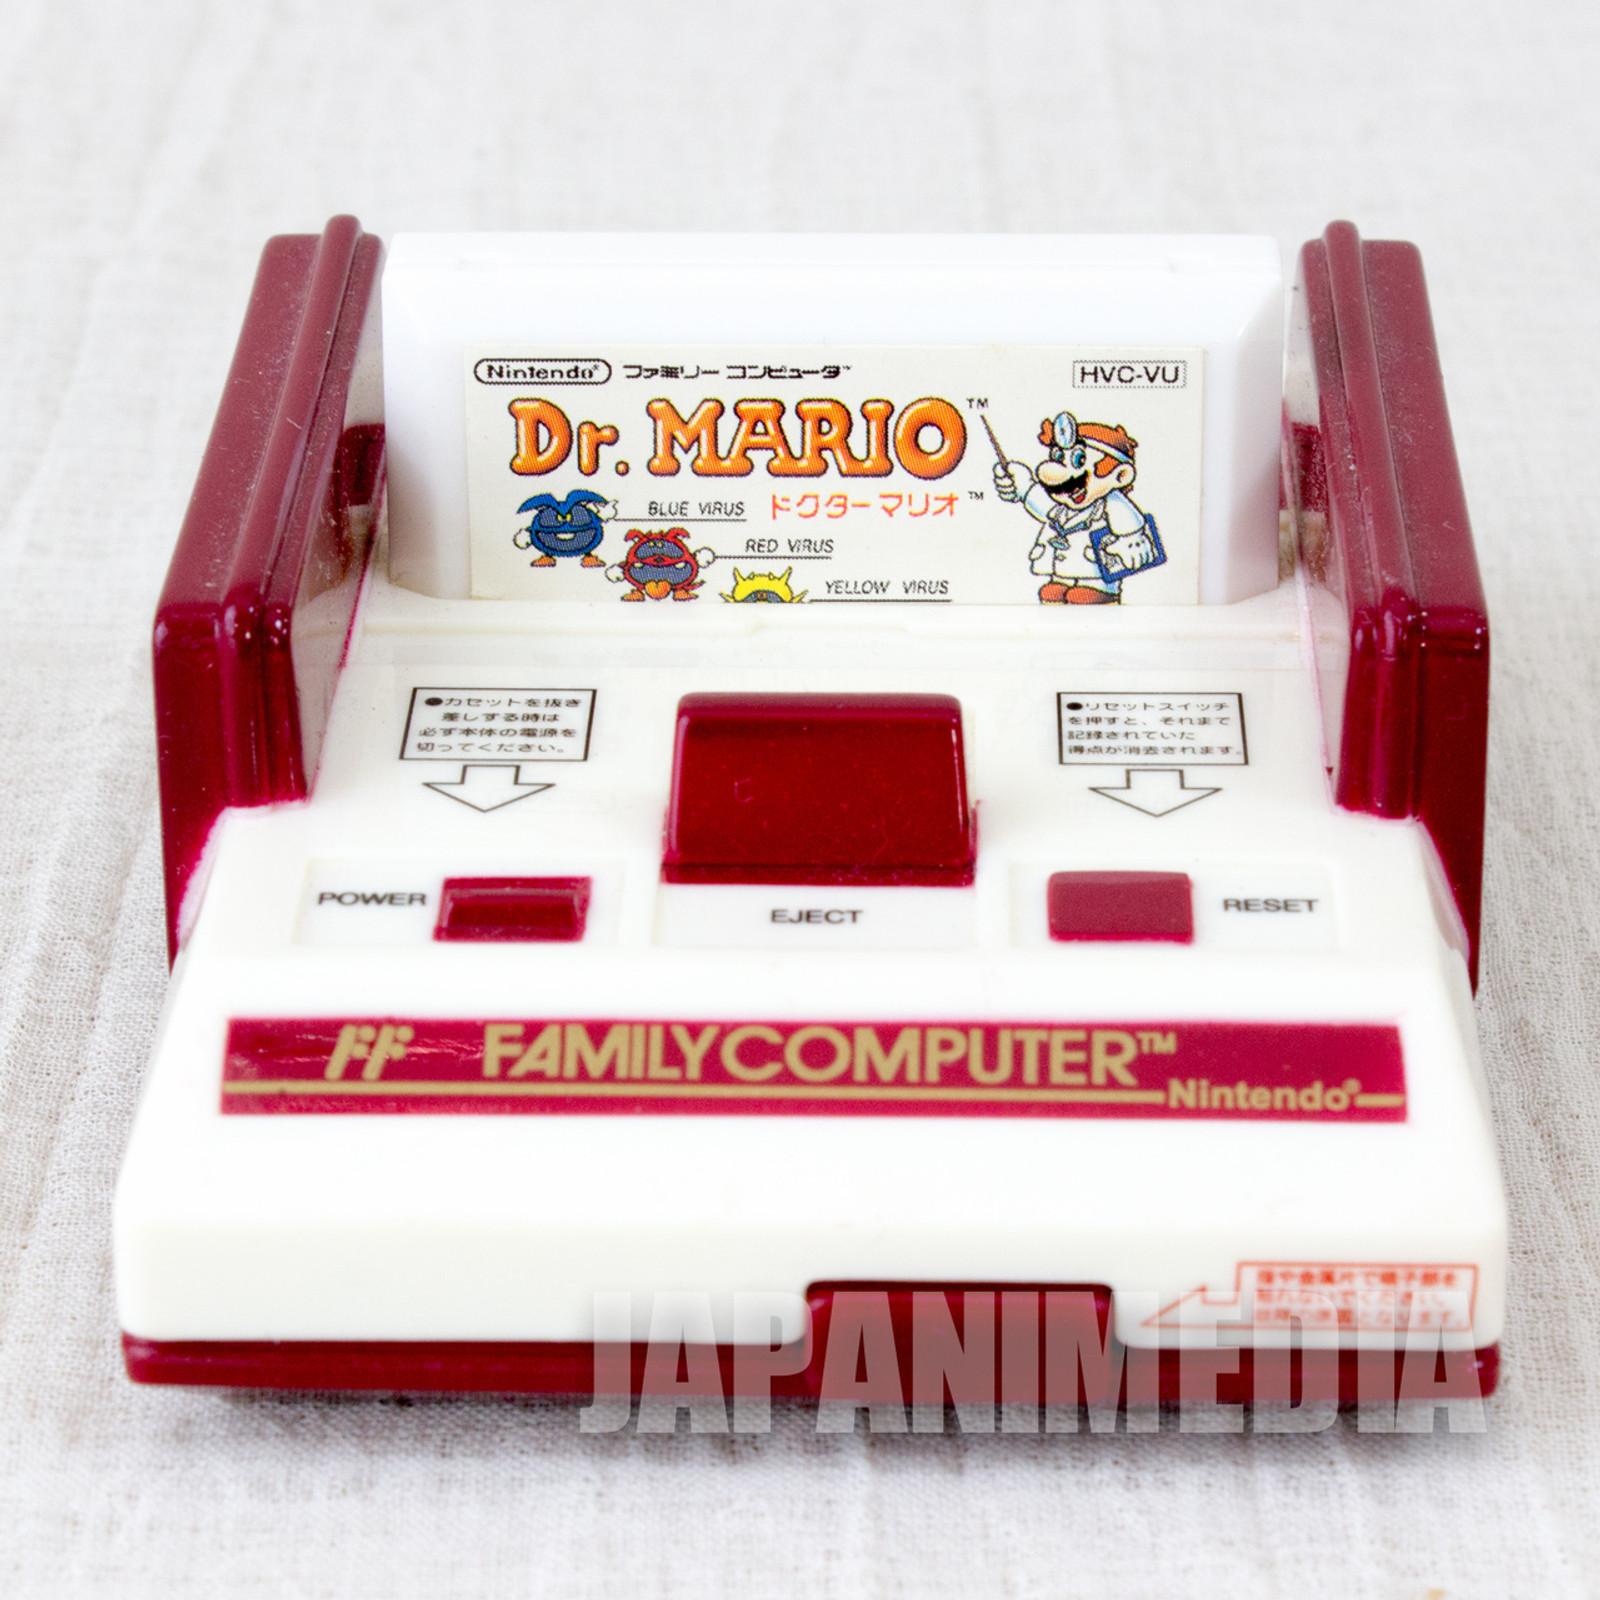 Dr. Mario Nintendo NES Famicom Family Computer Type Memo Paper Case JAPAN 2